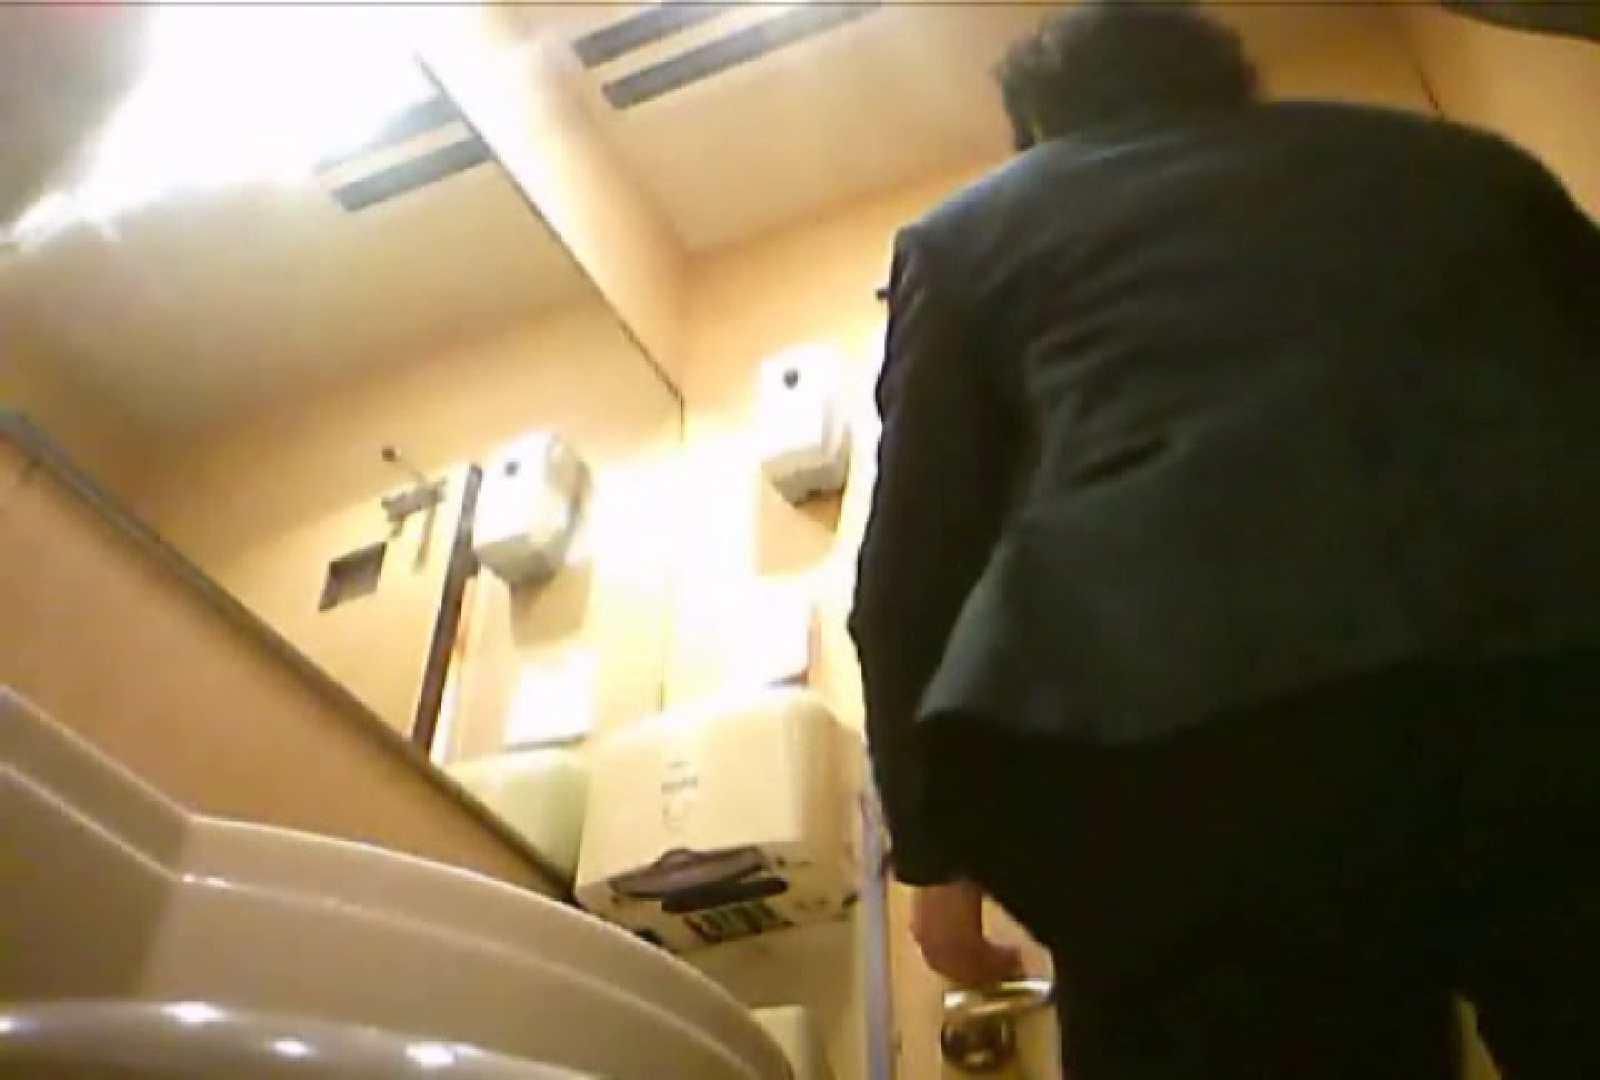 SEASON 2ND!掴み取りさんの洗面所覗き!in新幹線!VOL.02 スーツボーイズ | ノンケボーイズ  82pic 56